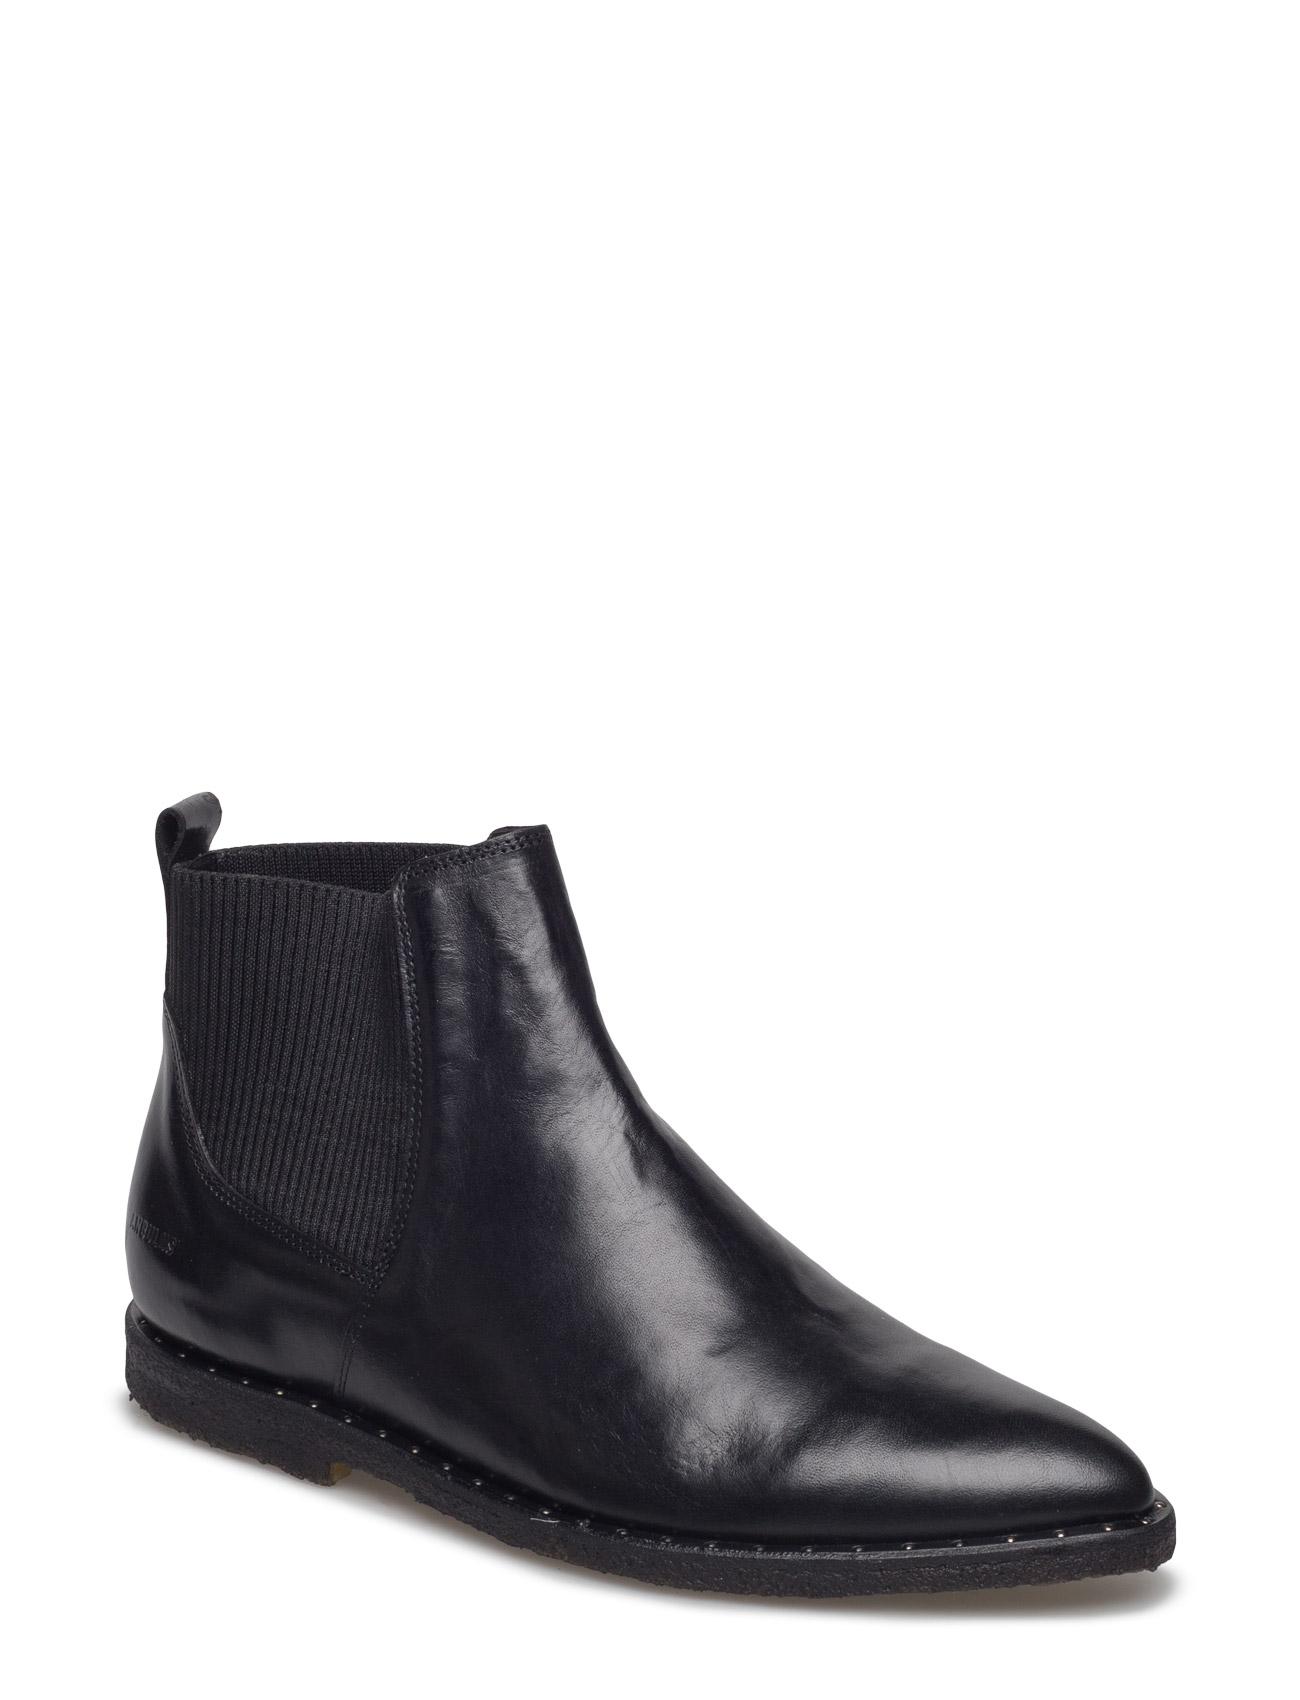 Booties - Flat - With Elastic ANGULUS Støvler til Damer i